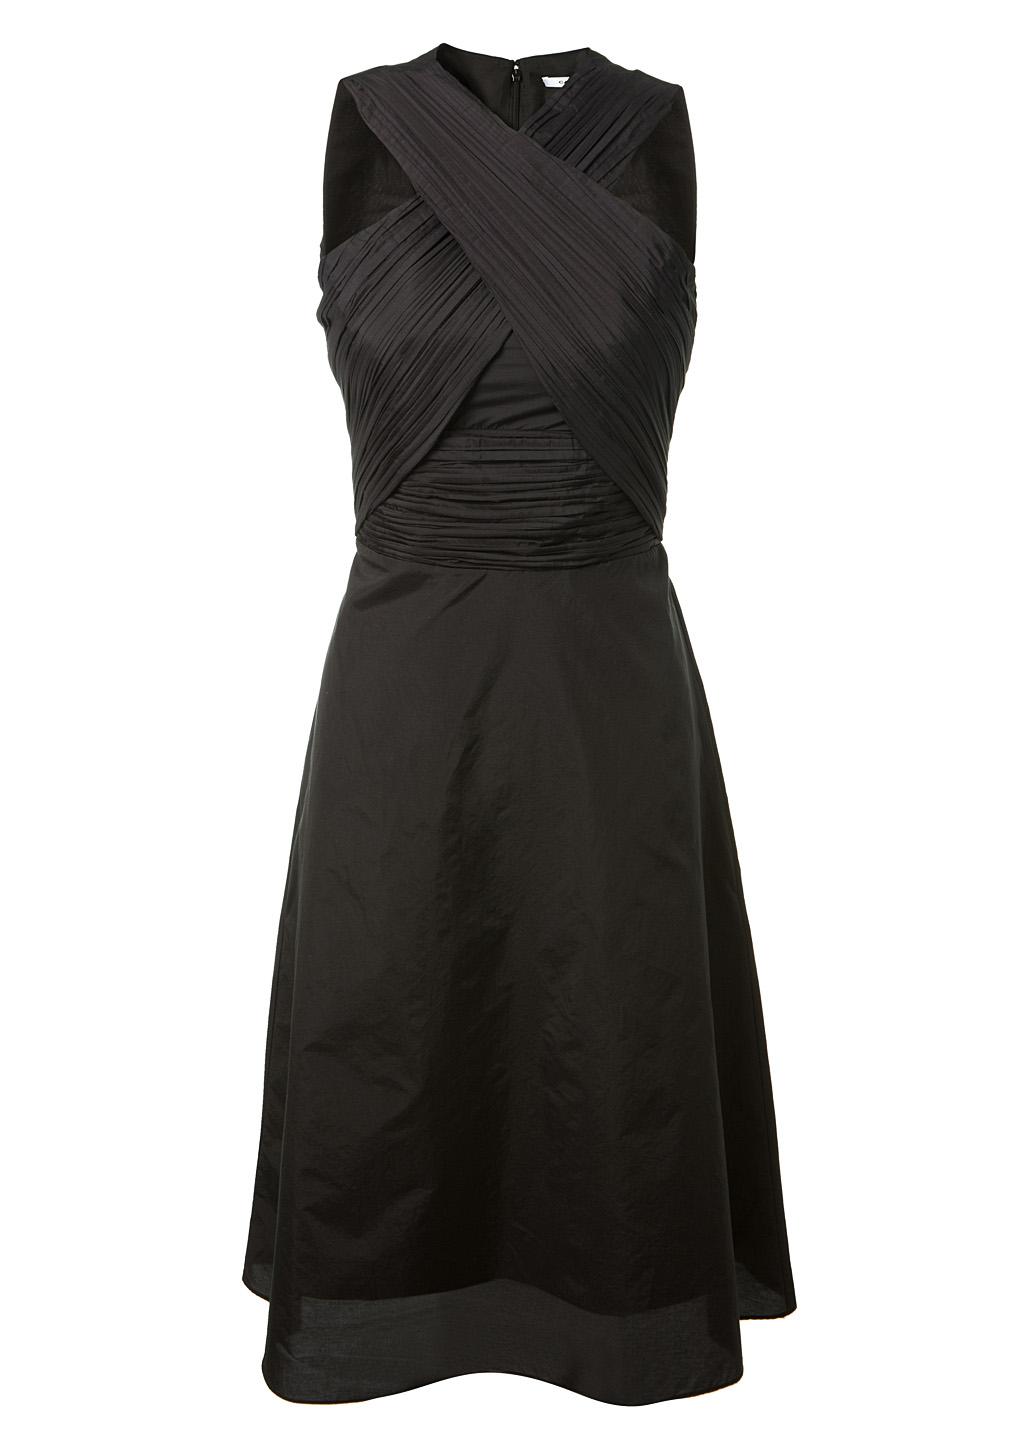 eaa30e60bd Carven Black Cotton Blend Dress With Criss Cross Neck